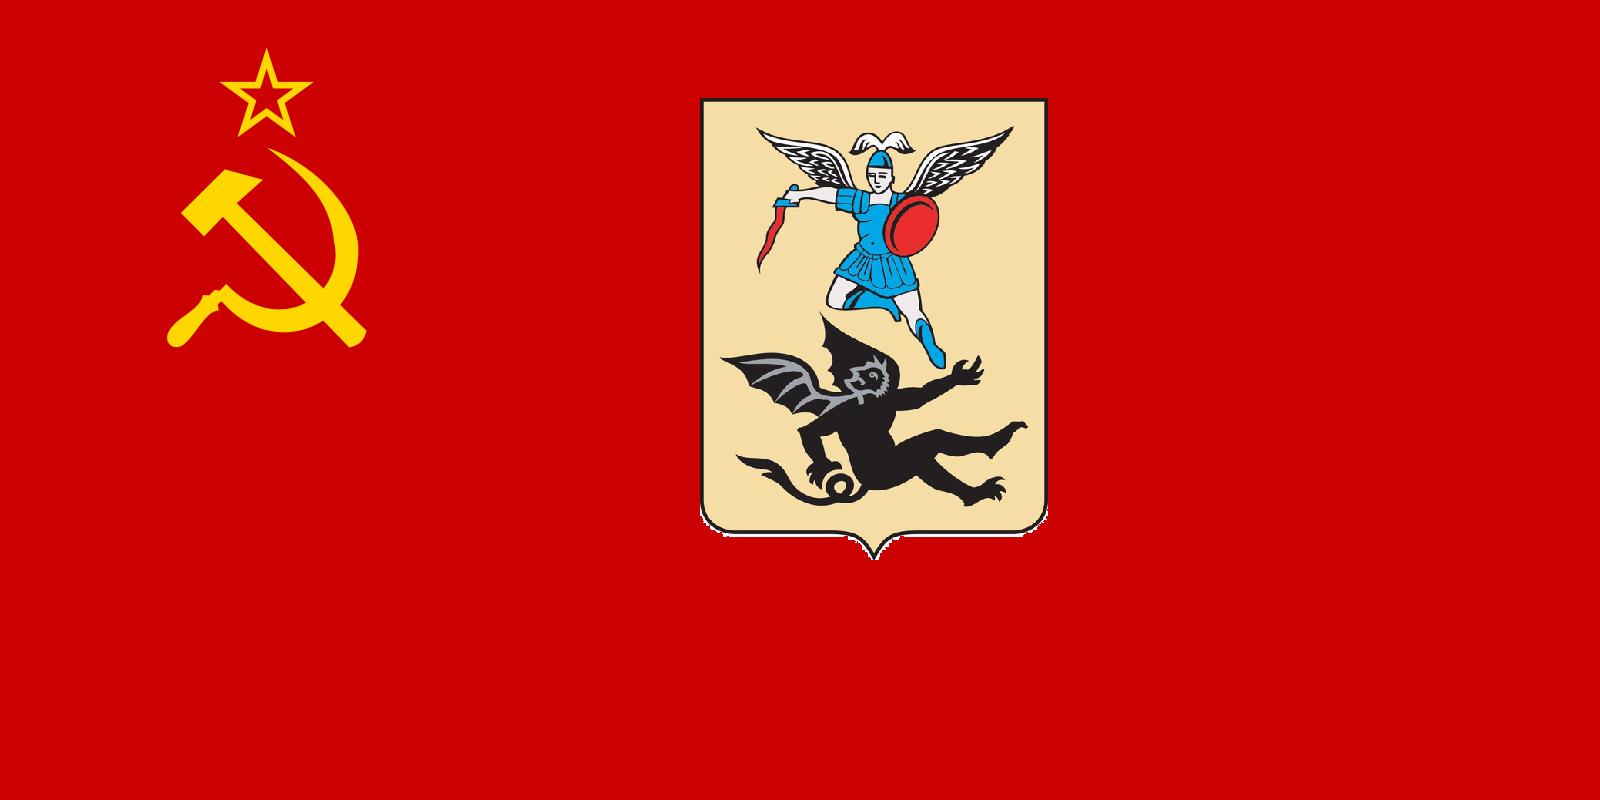 Arkhangelsk Autonomous Okrug (1861: Historical Failing)